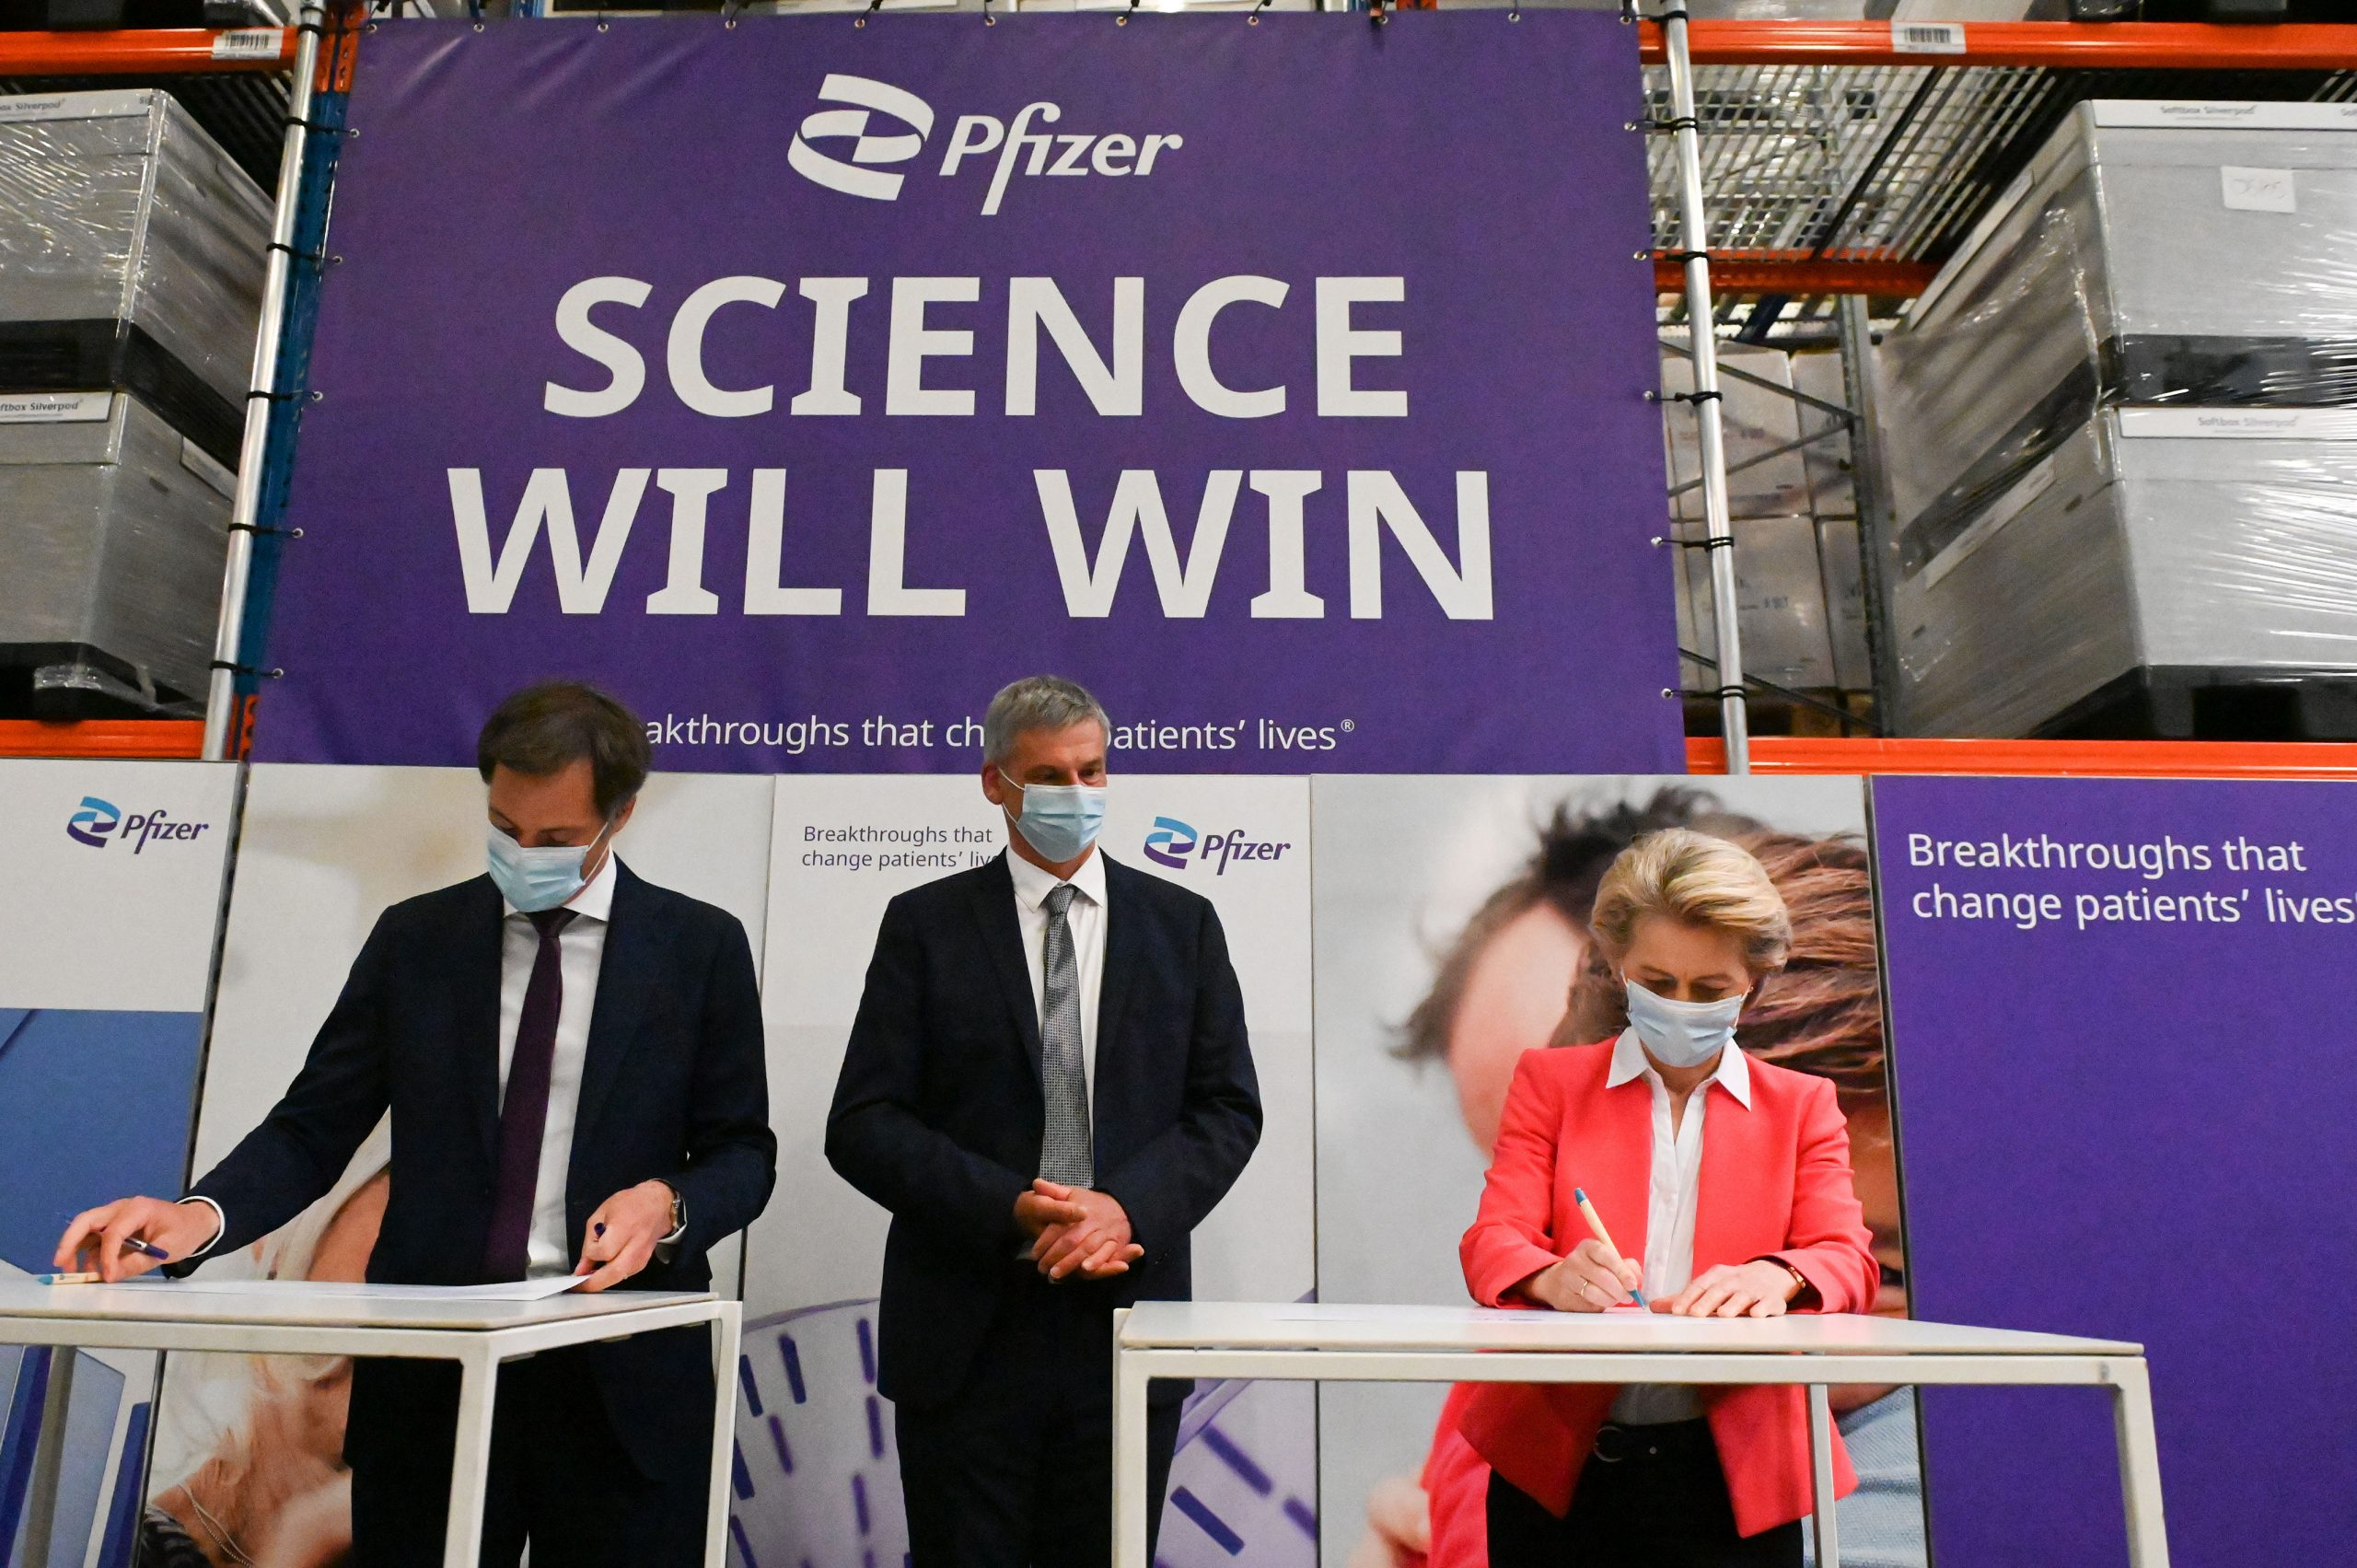 Ursula von der Leyen, presidenta de la Comissió Europea, a la fàbrica de Pfizer a Puurs-Sint-Amands, on es produeix la vacuna de Pfizer-BioNTech | ACN